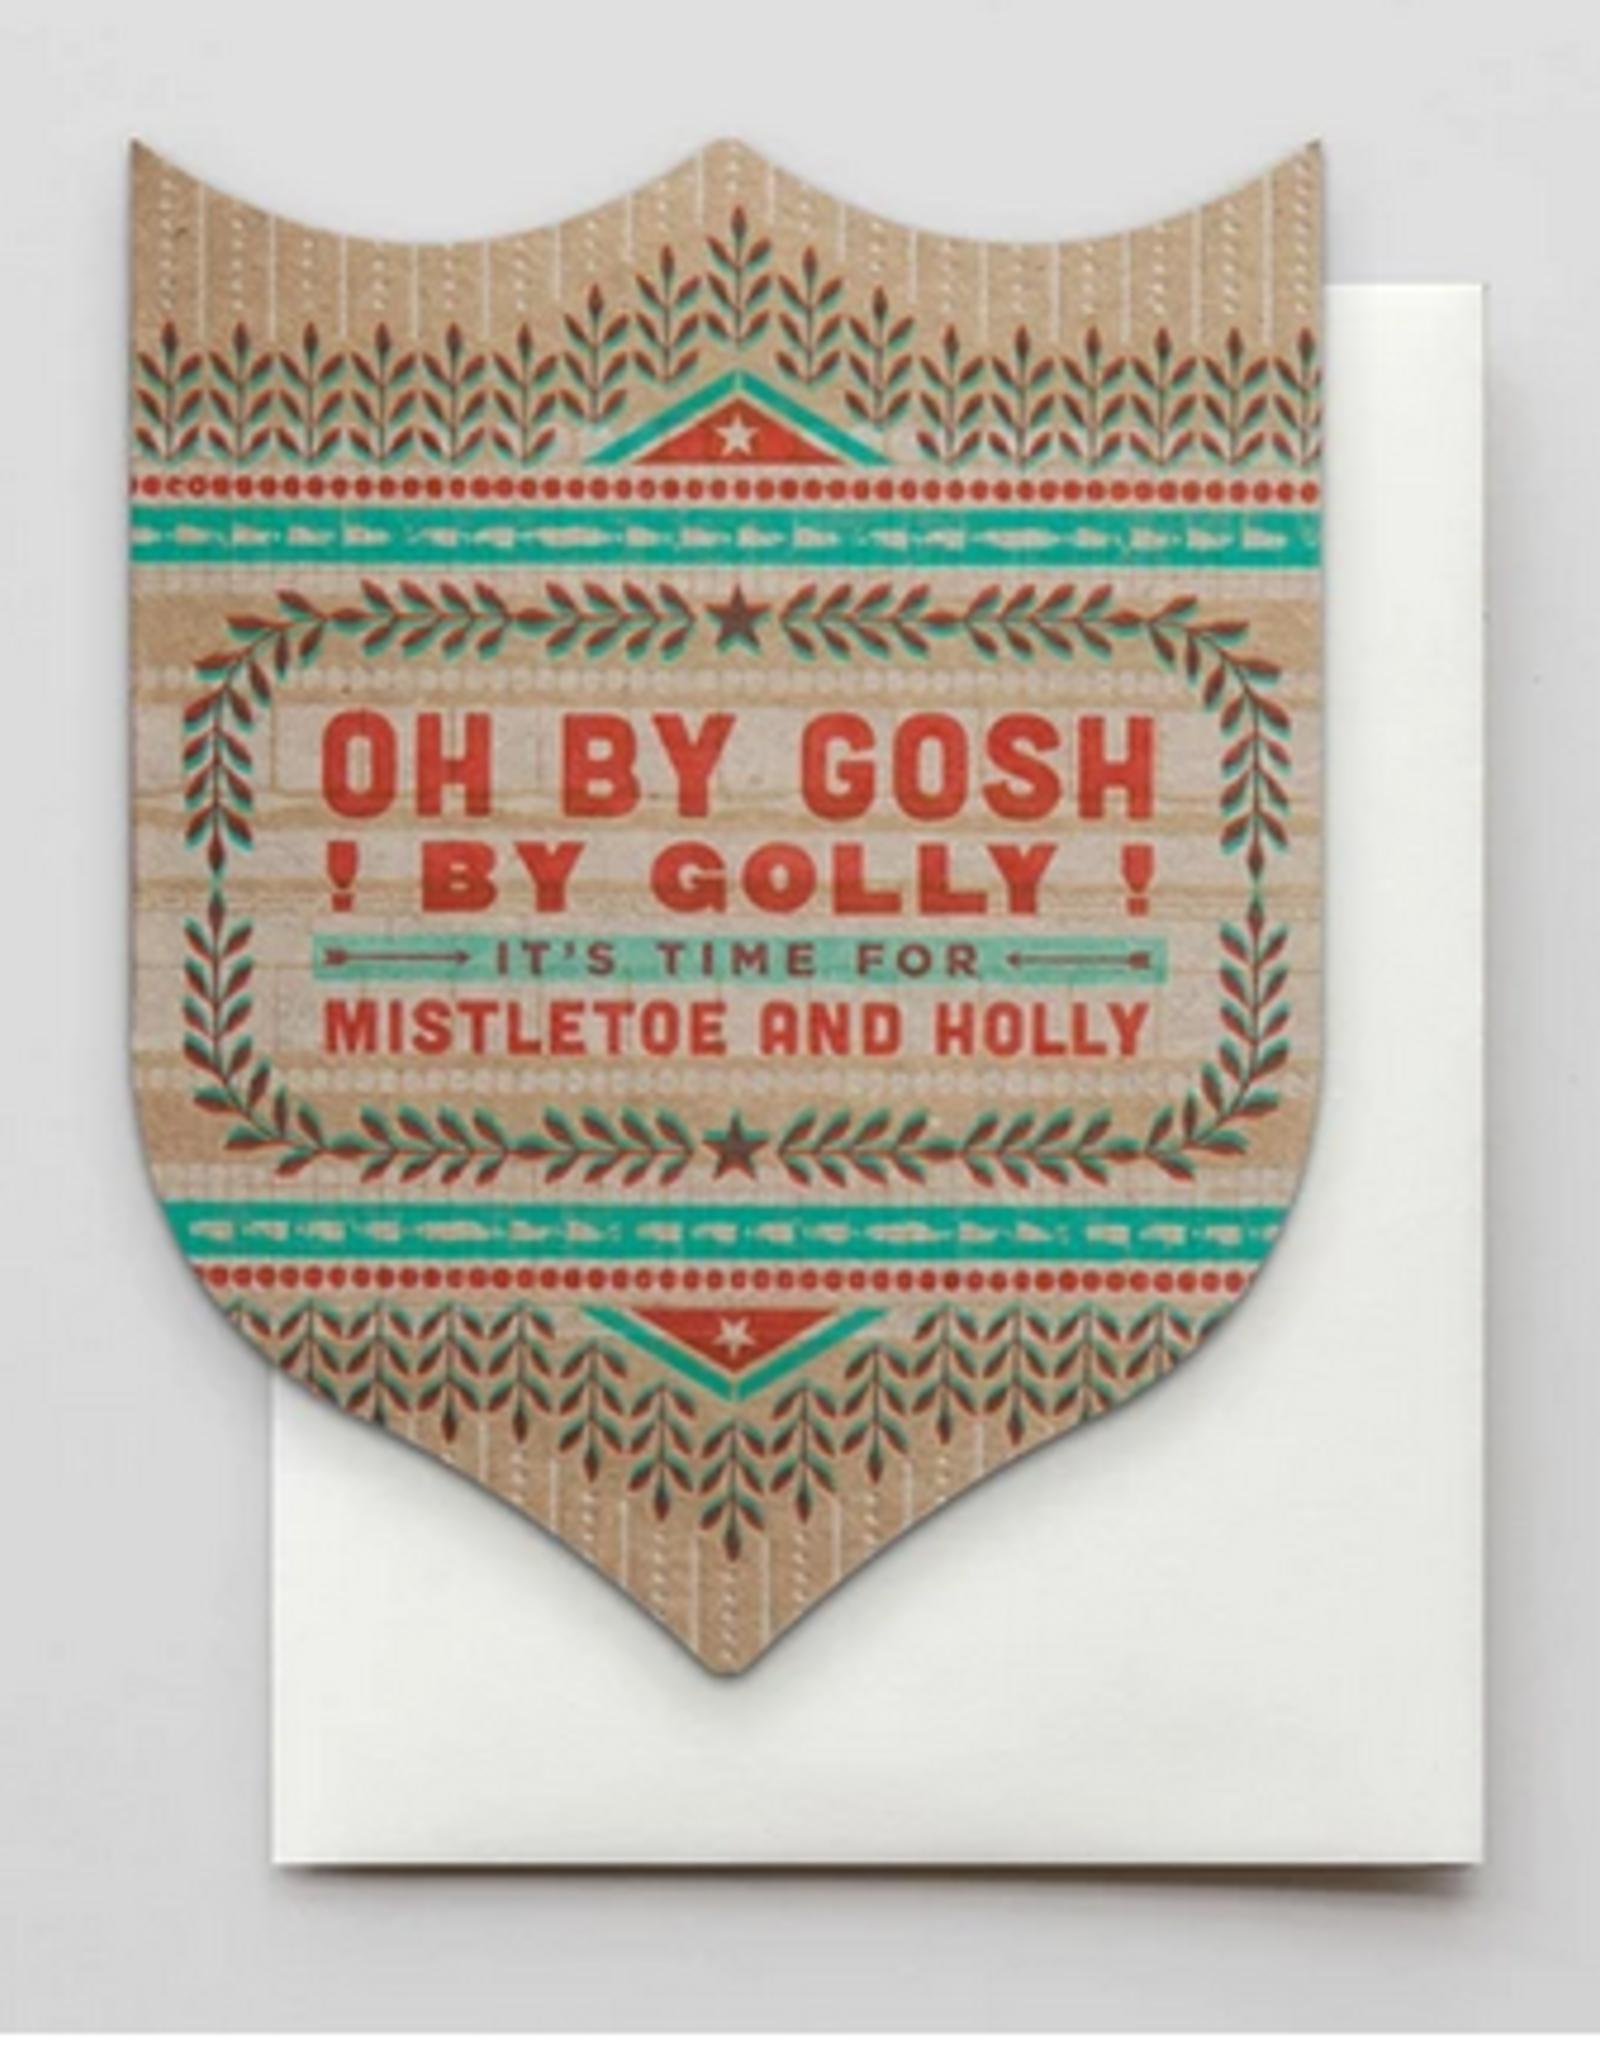 Mistletoe and Holly Holiday Card